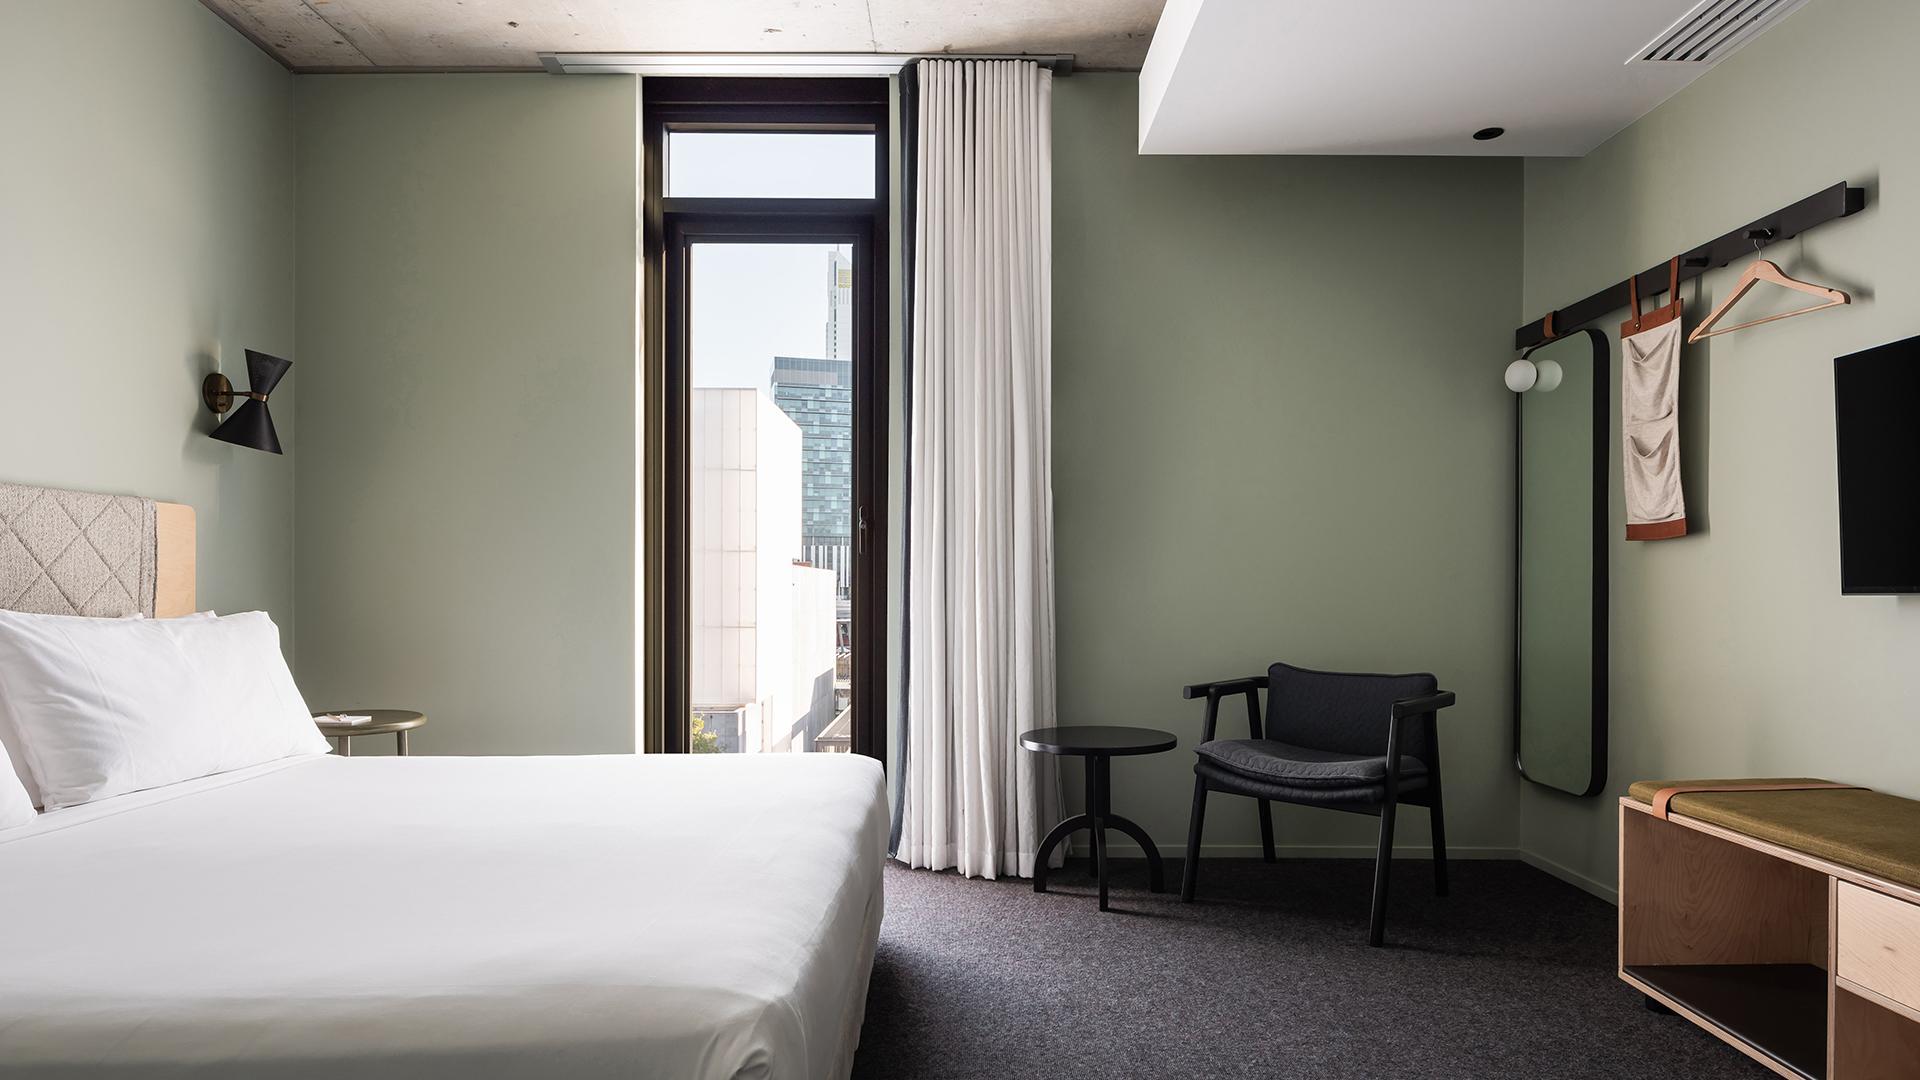 Large image 1 at Alex Hotel Perth by City of Perth, Western Australia, Australia